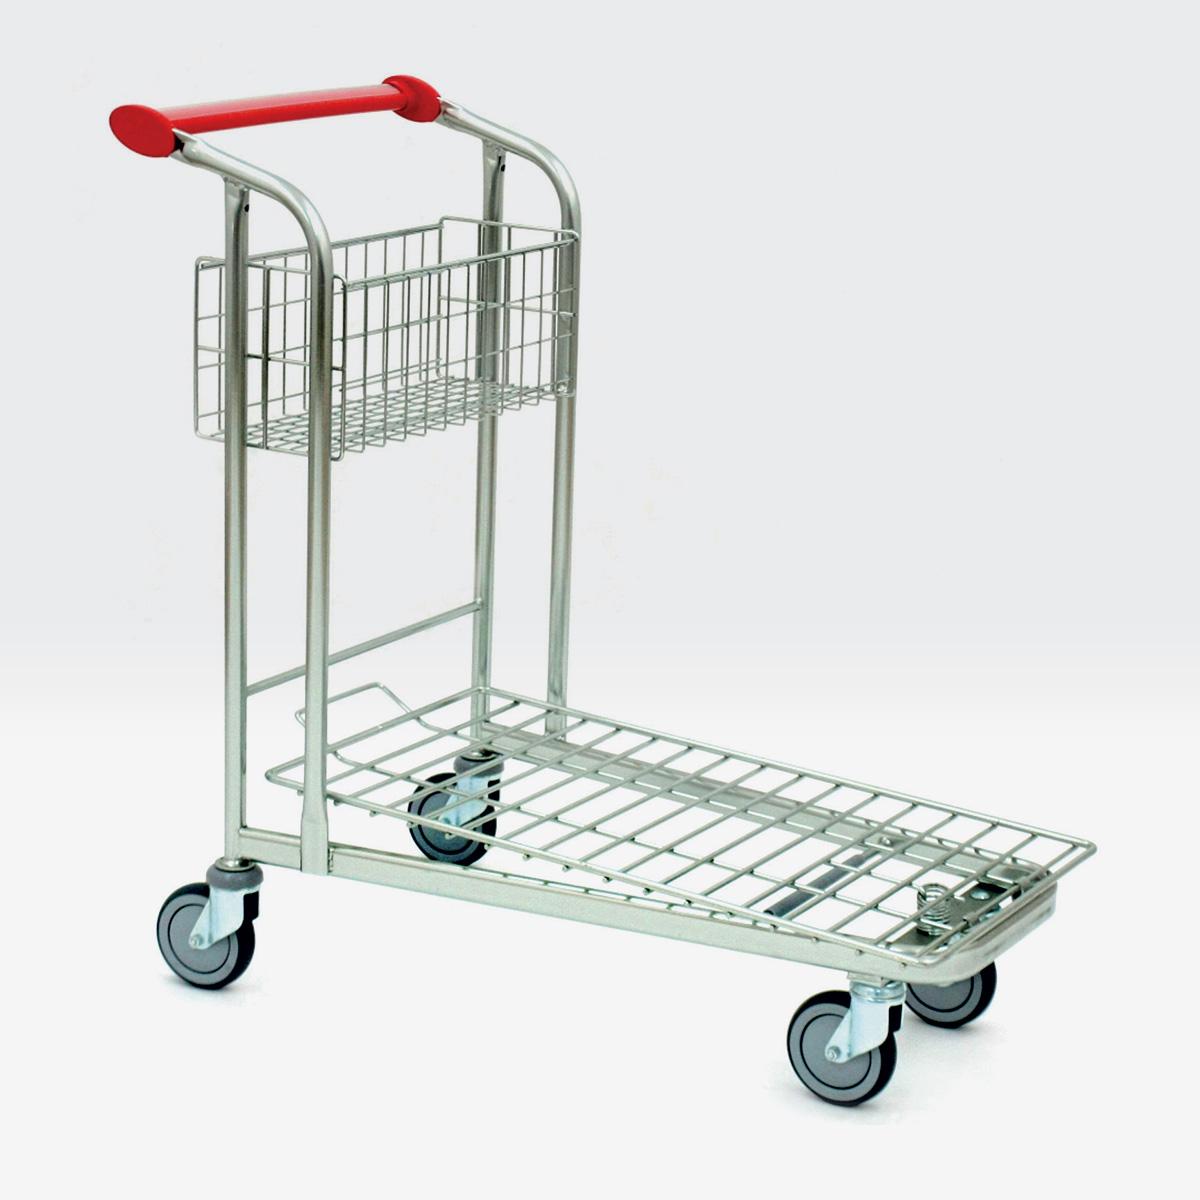 Carrello trasporto merci VARIO 70-PN-1